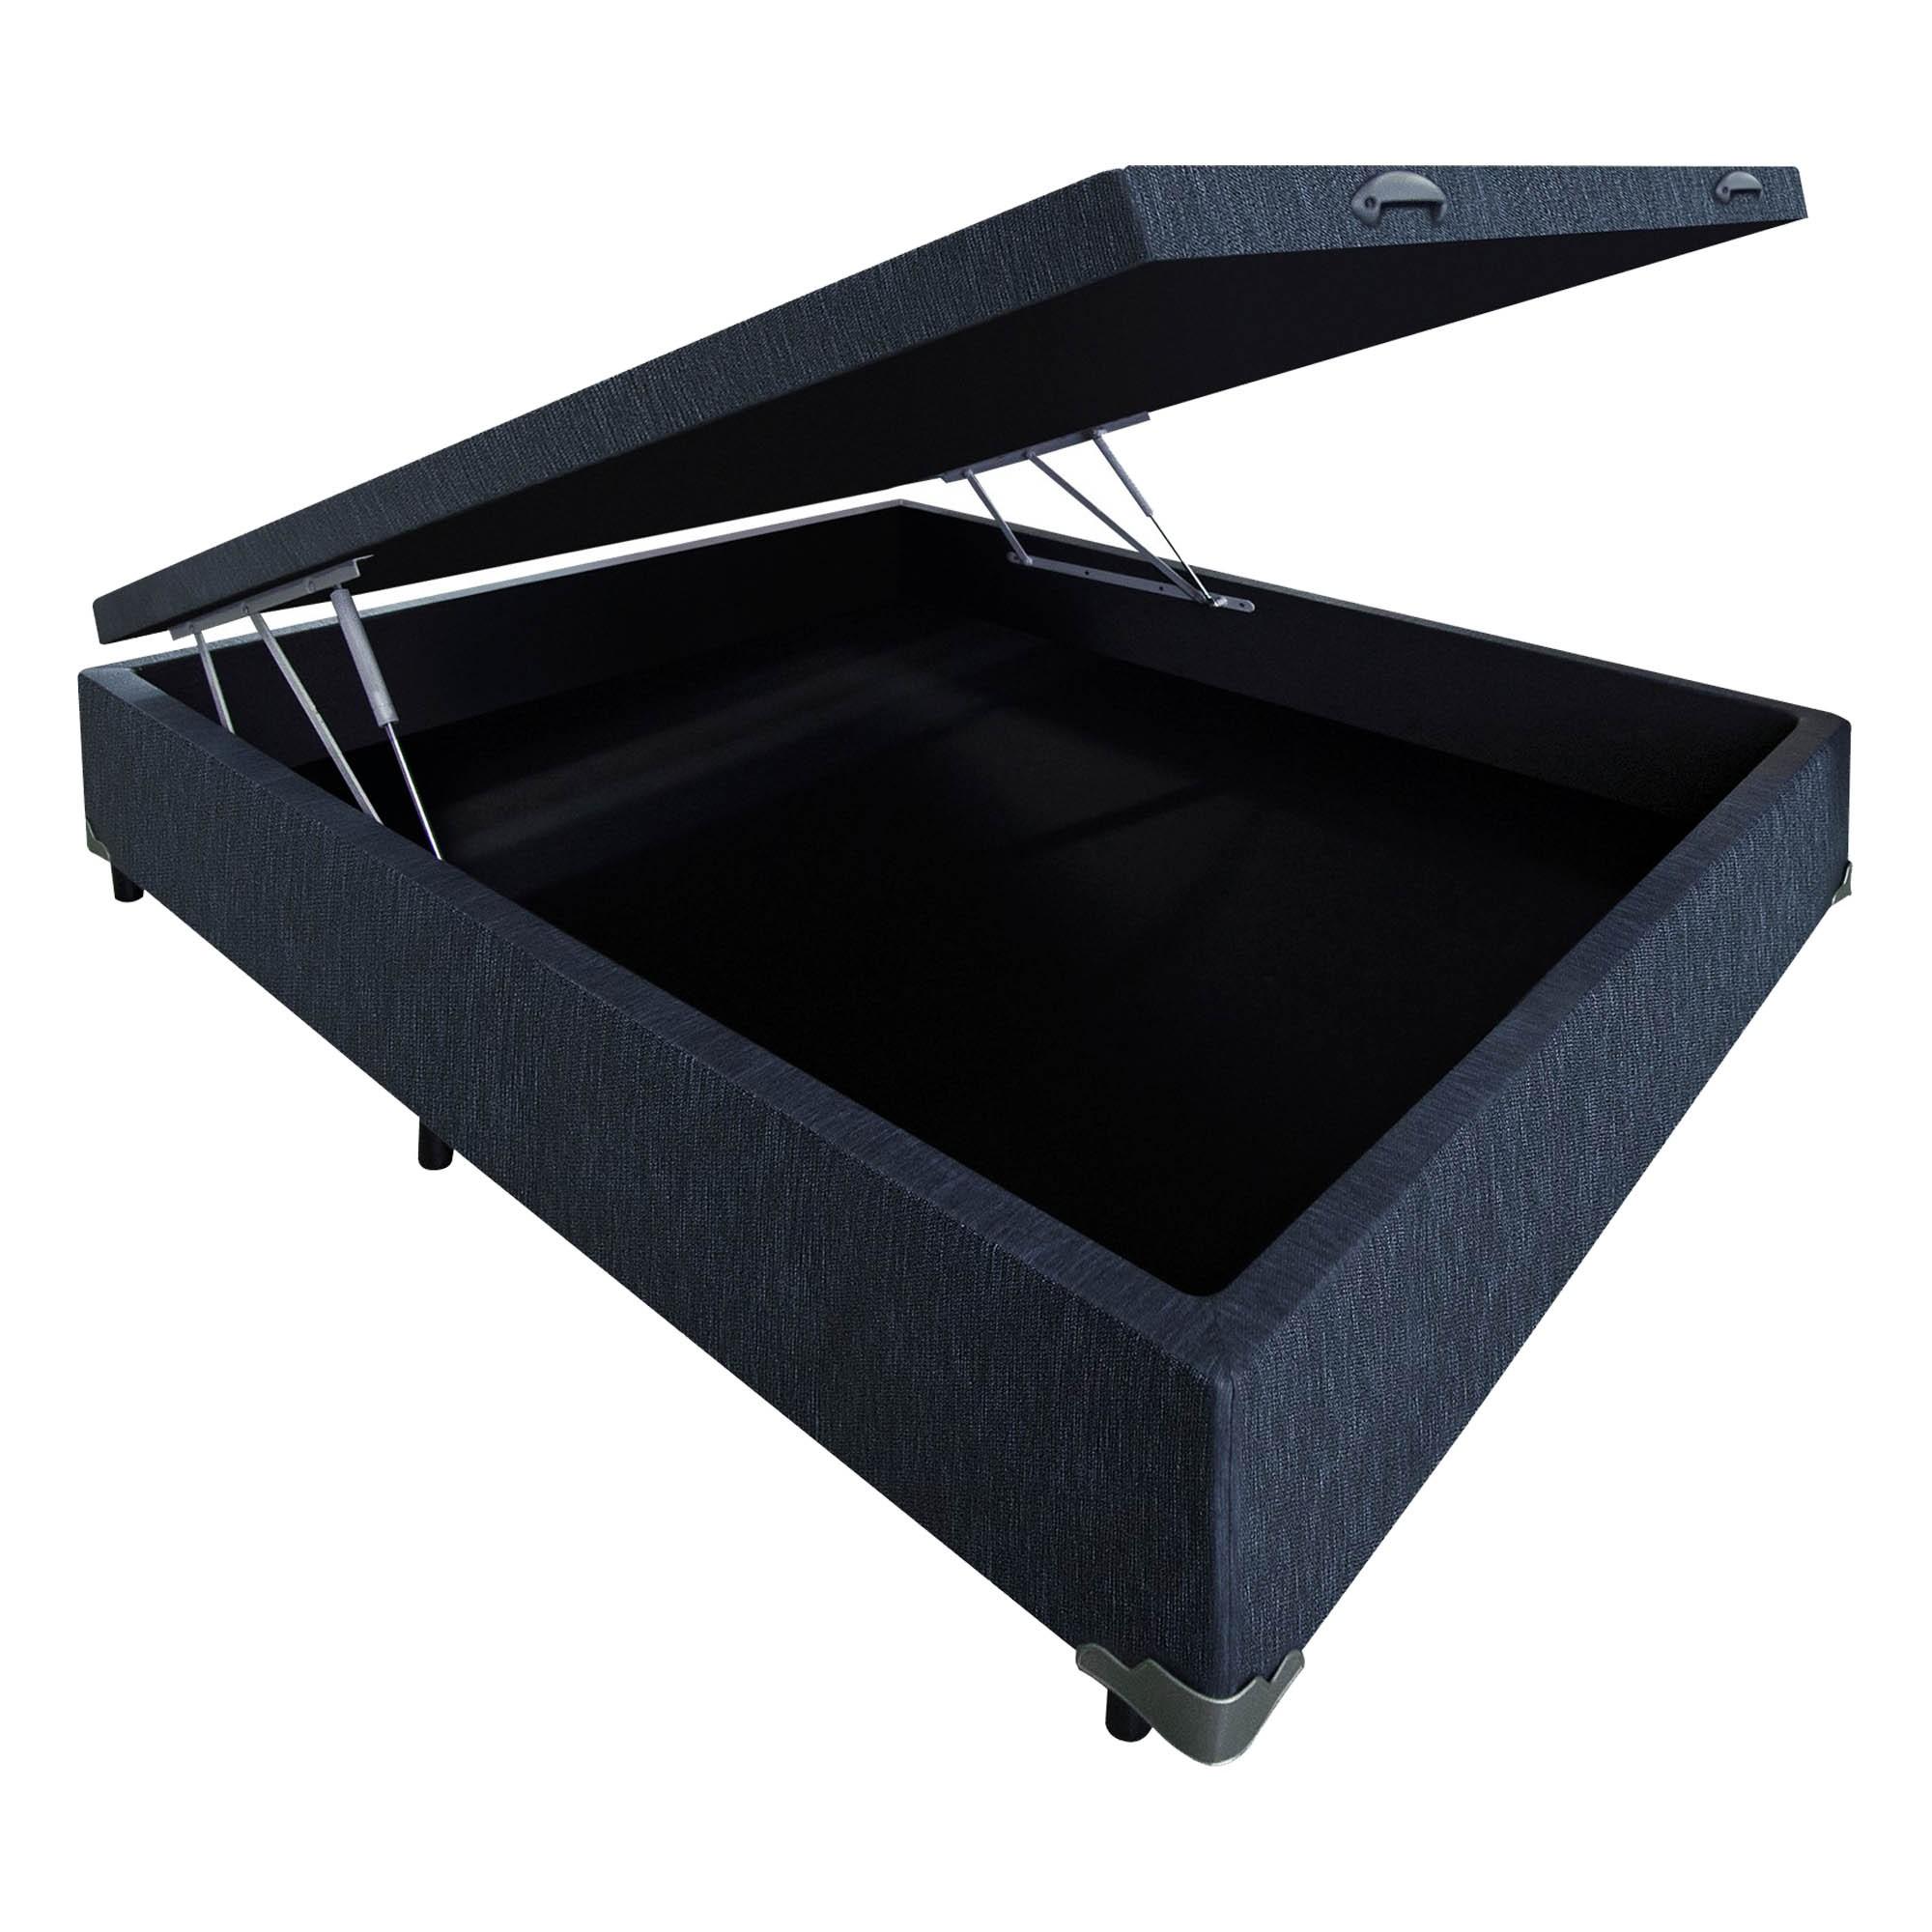 Box Baú Linhão Cosmo [Viúva 120 x 203 cm]